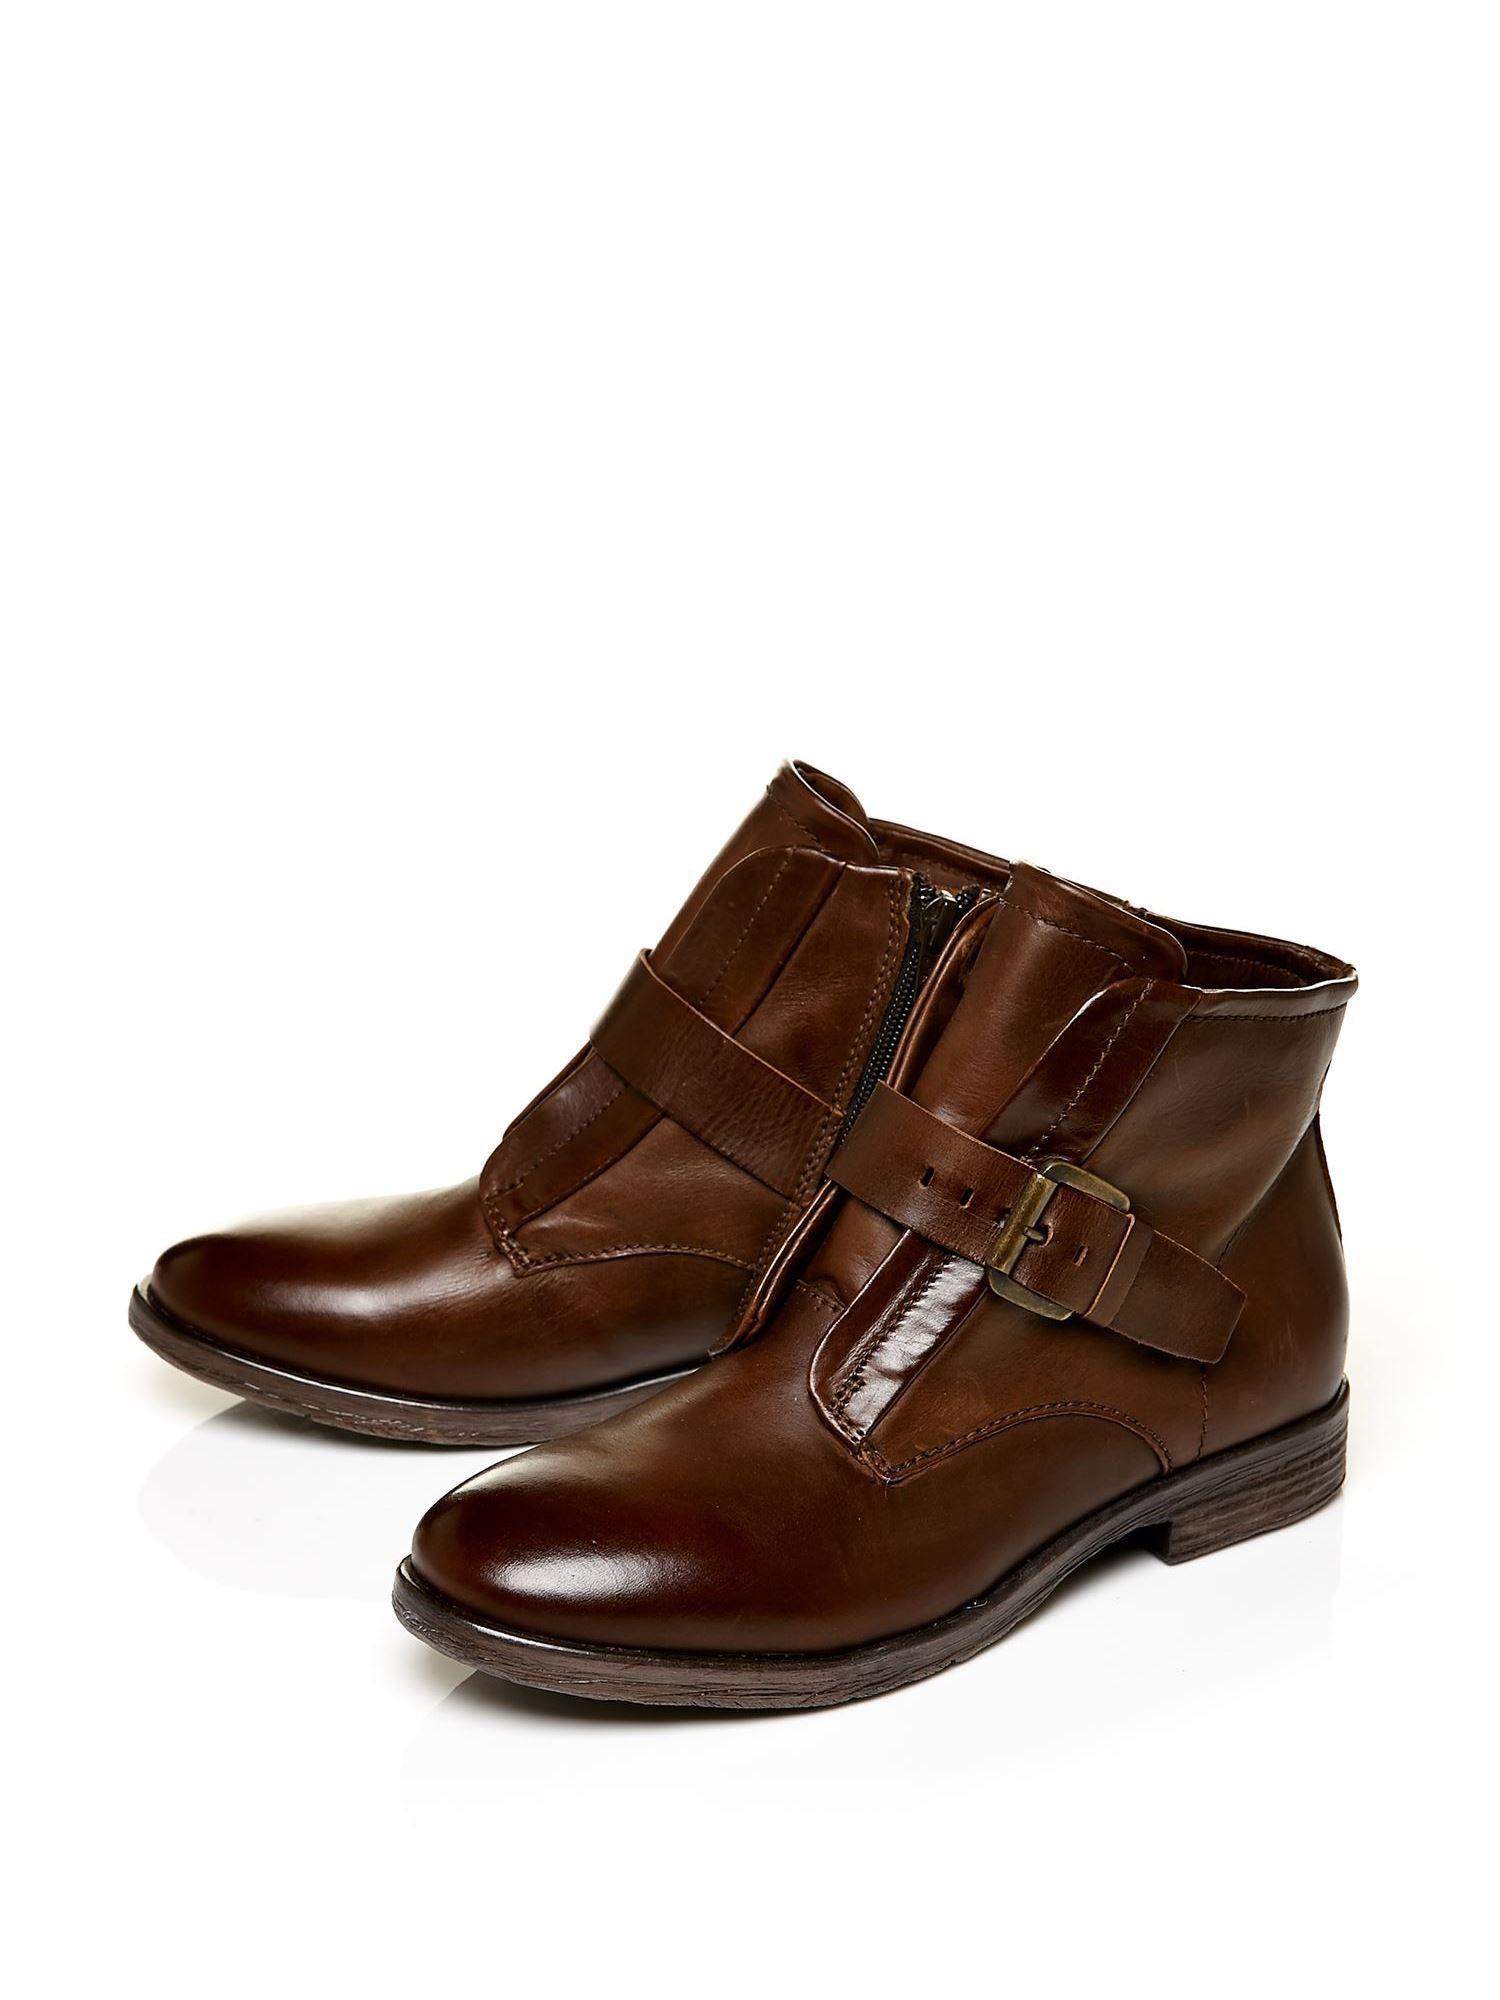 moda in pelle unbeaten smart casual pull on ankle boots in